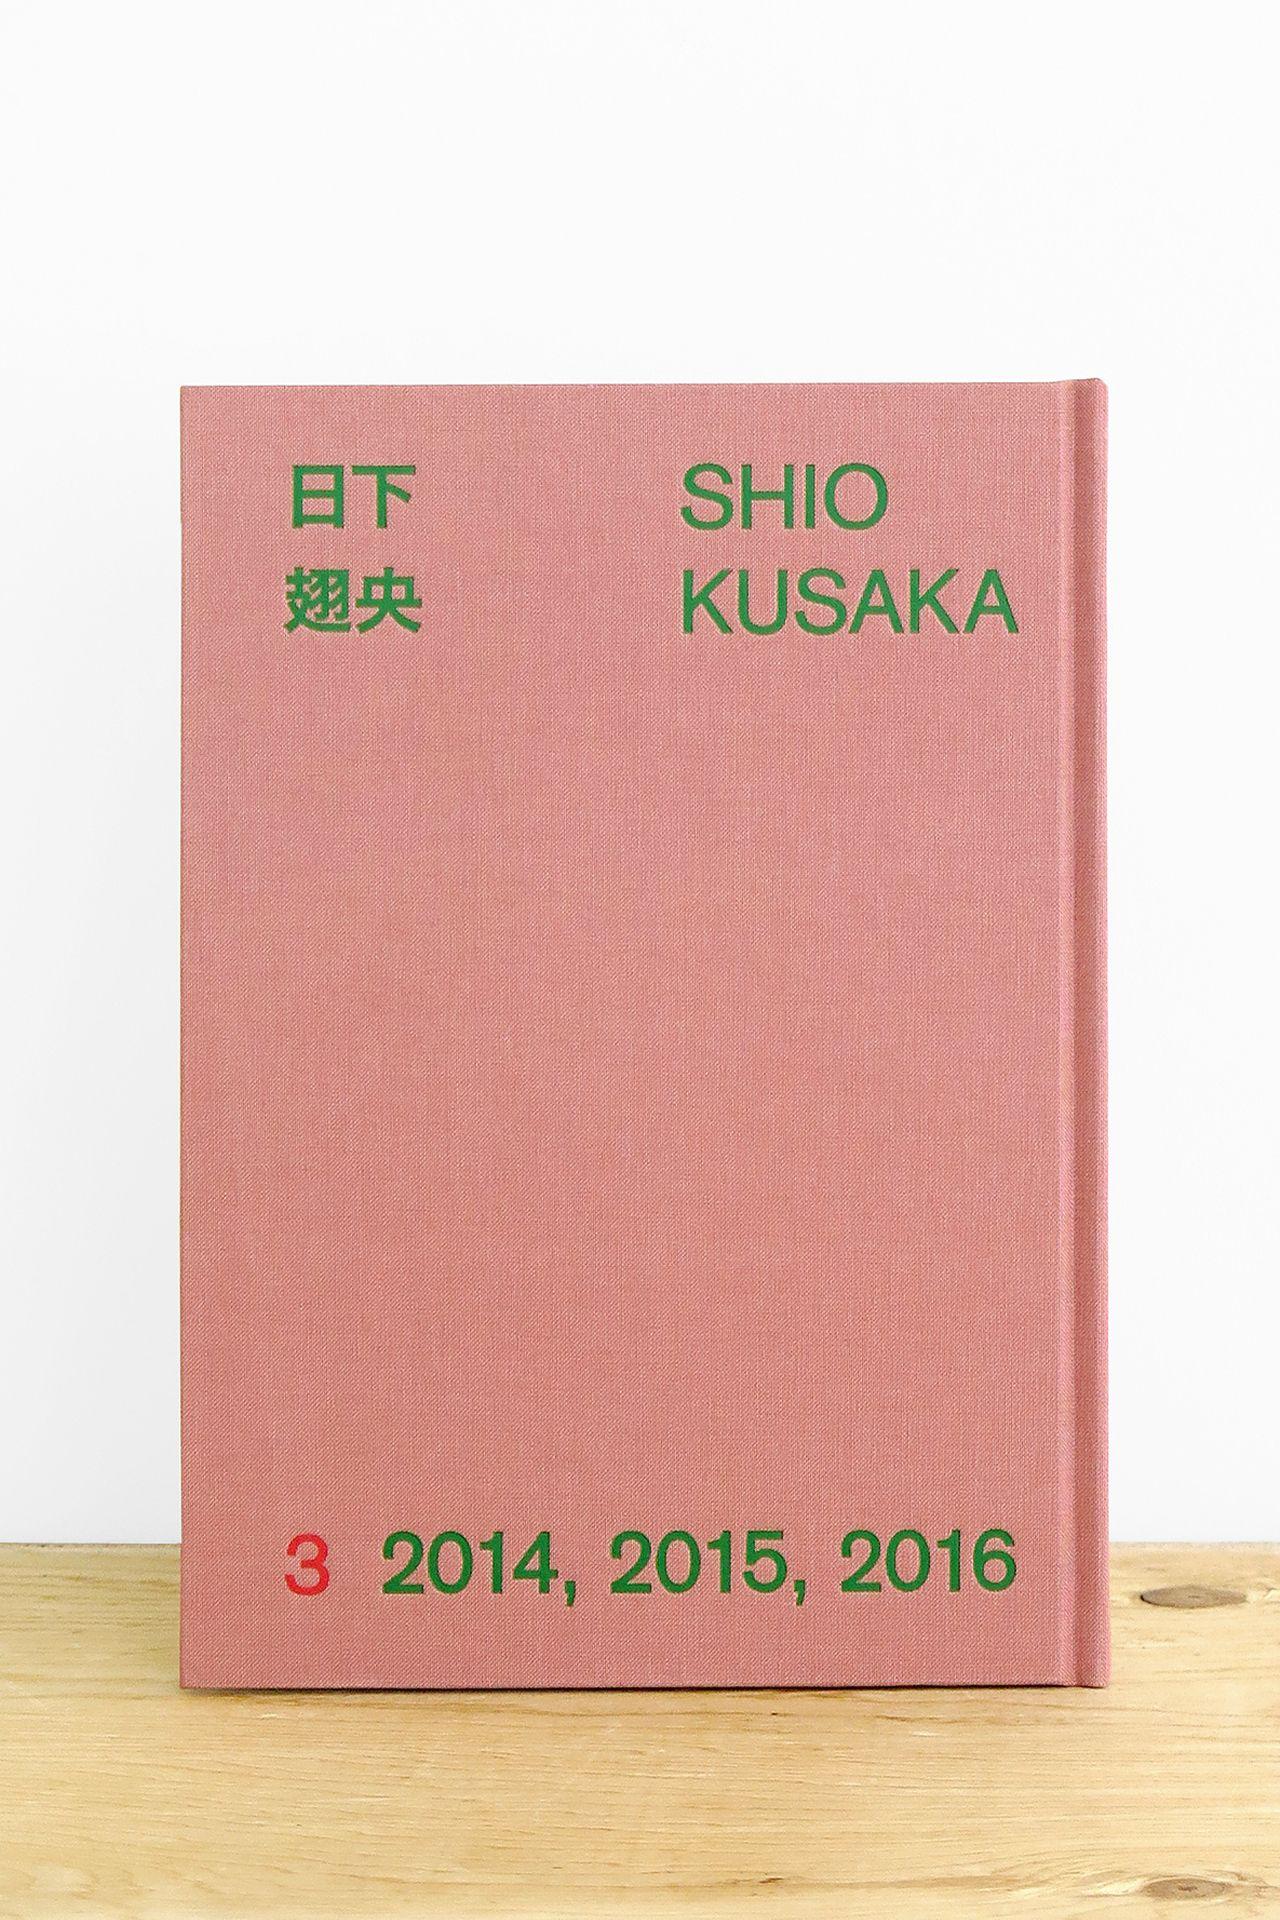 "karmakarmanyc: "" Shio Kusaka KARMA, New York 2016 96 pages, Hardcover 10 ¼ x 7 ½ inches $40 Purchase Photos """